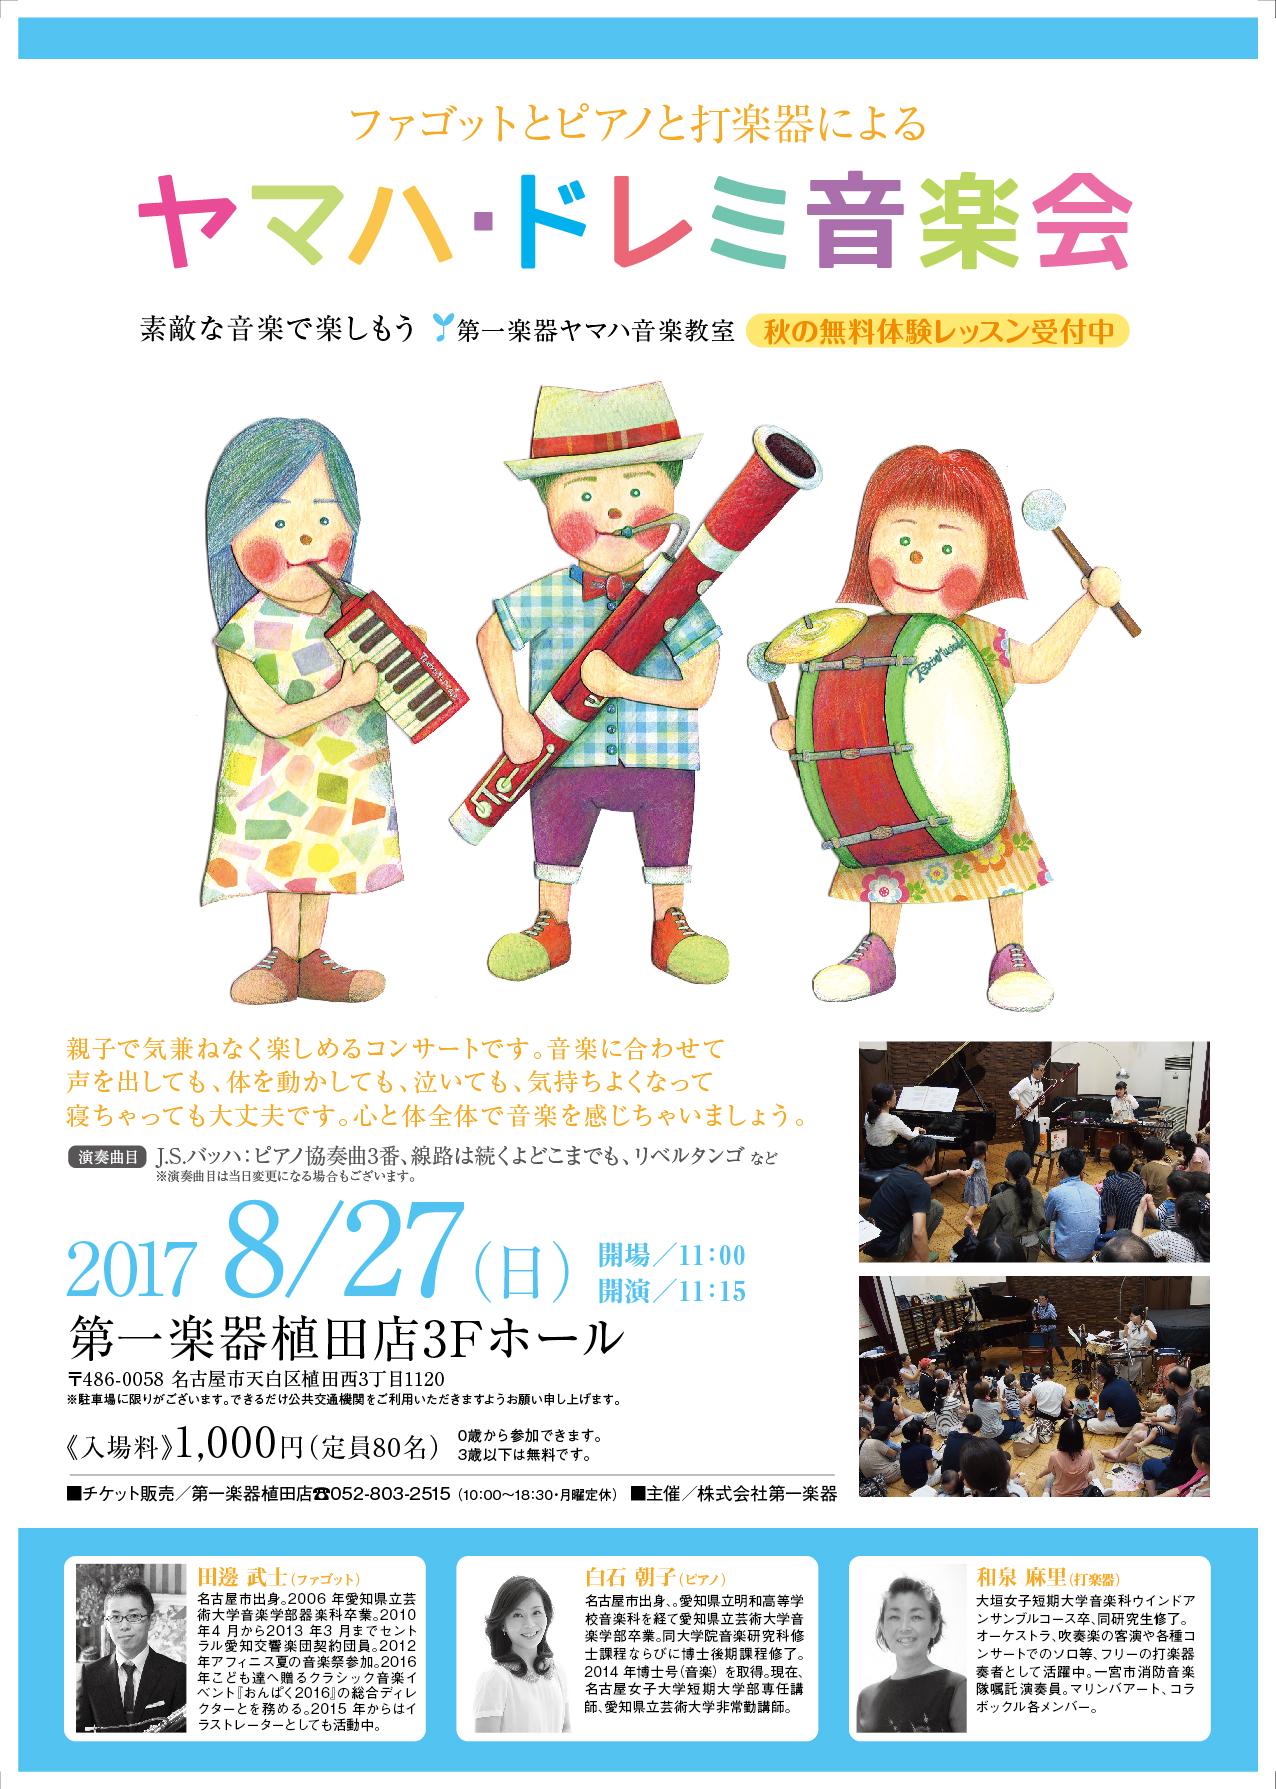 doremi_ongakukai2017_ueda